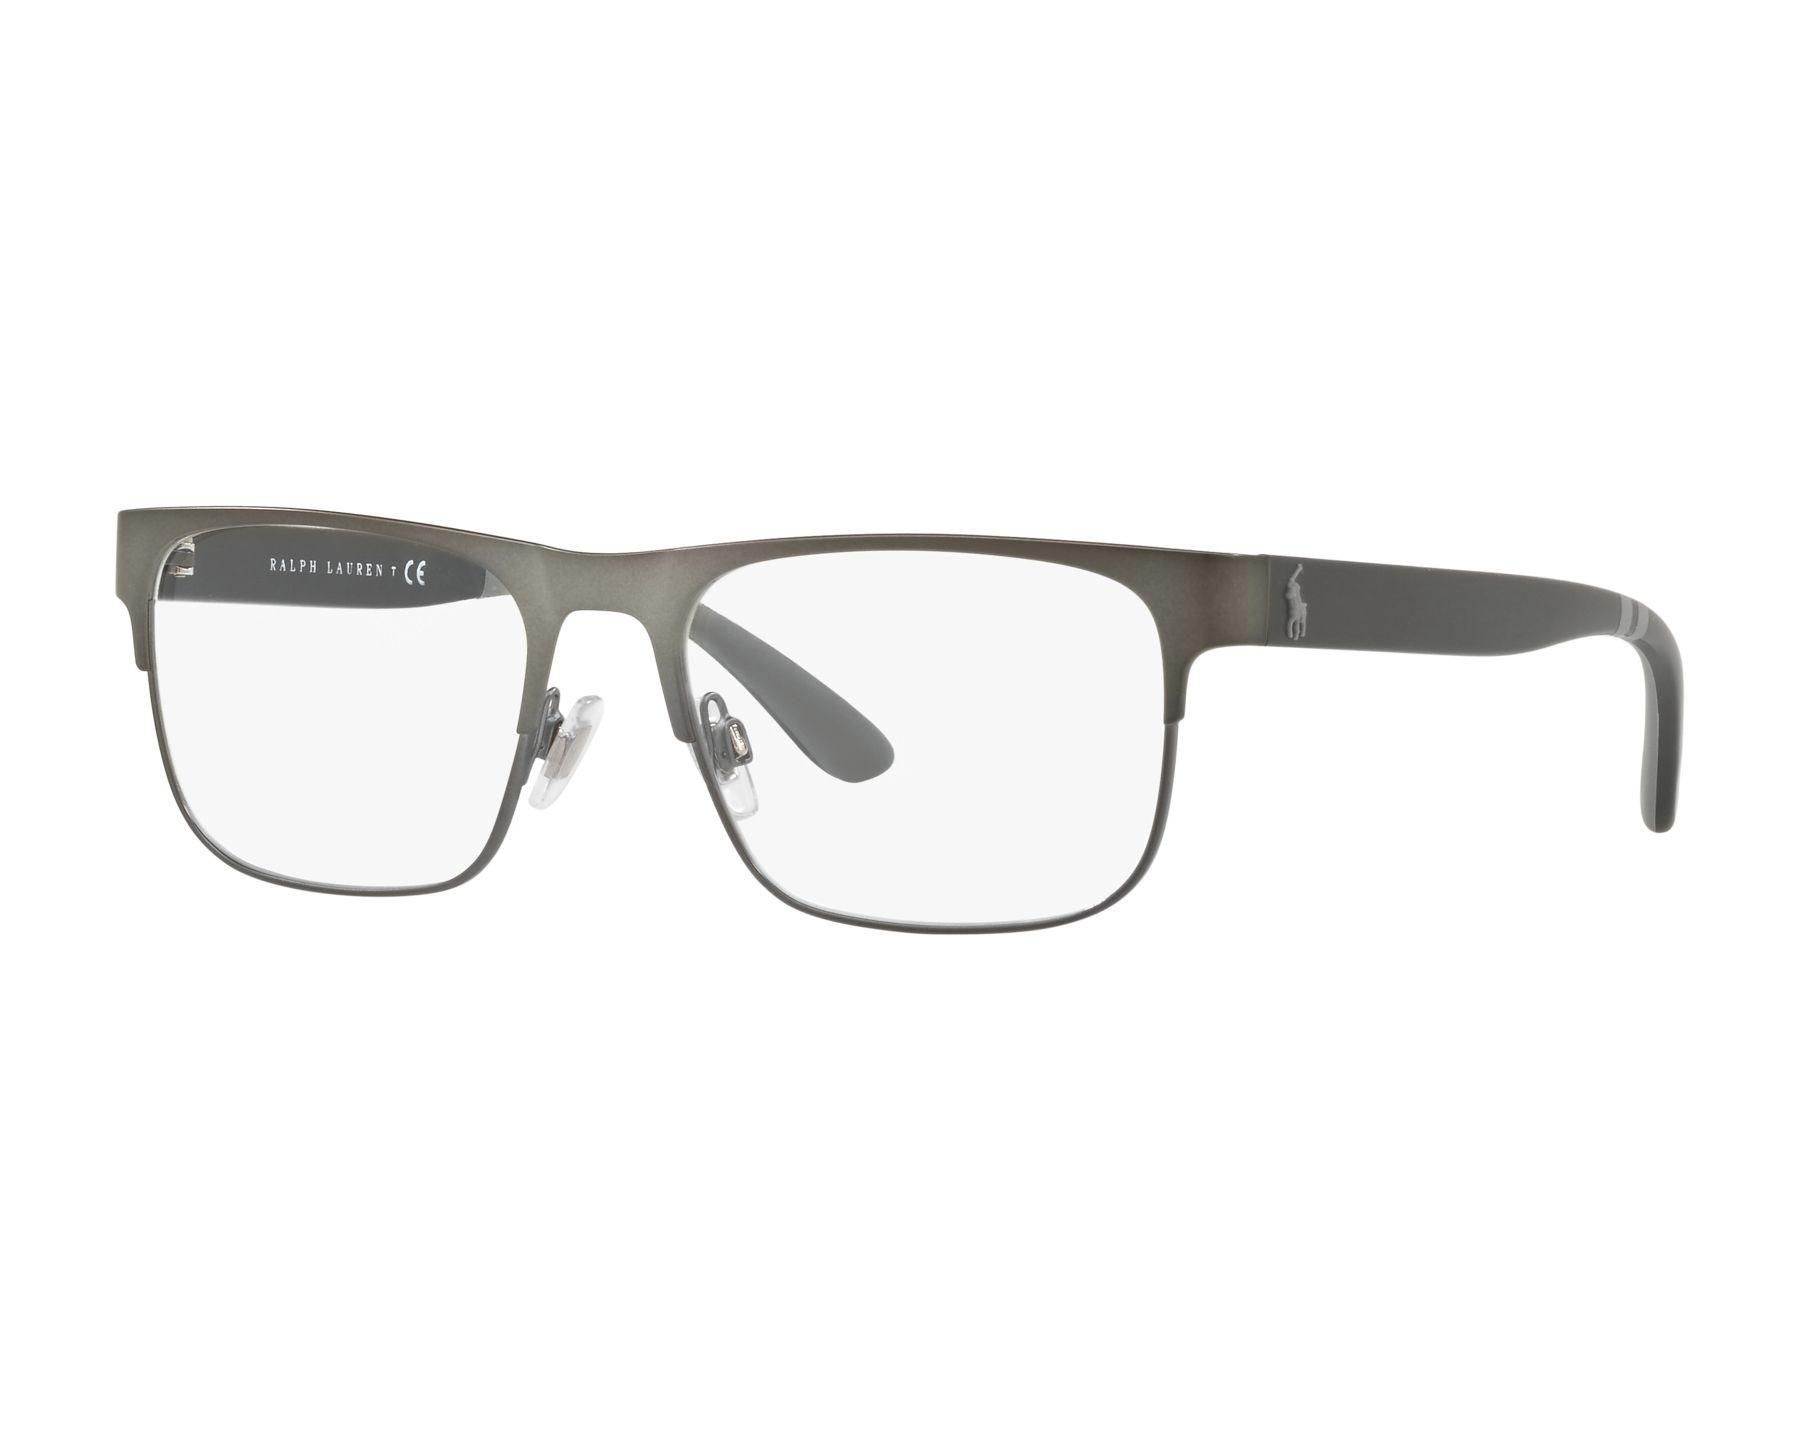 Polo Ralph Lauren 1178 9157 - Oculos de Grau